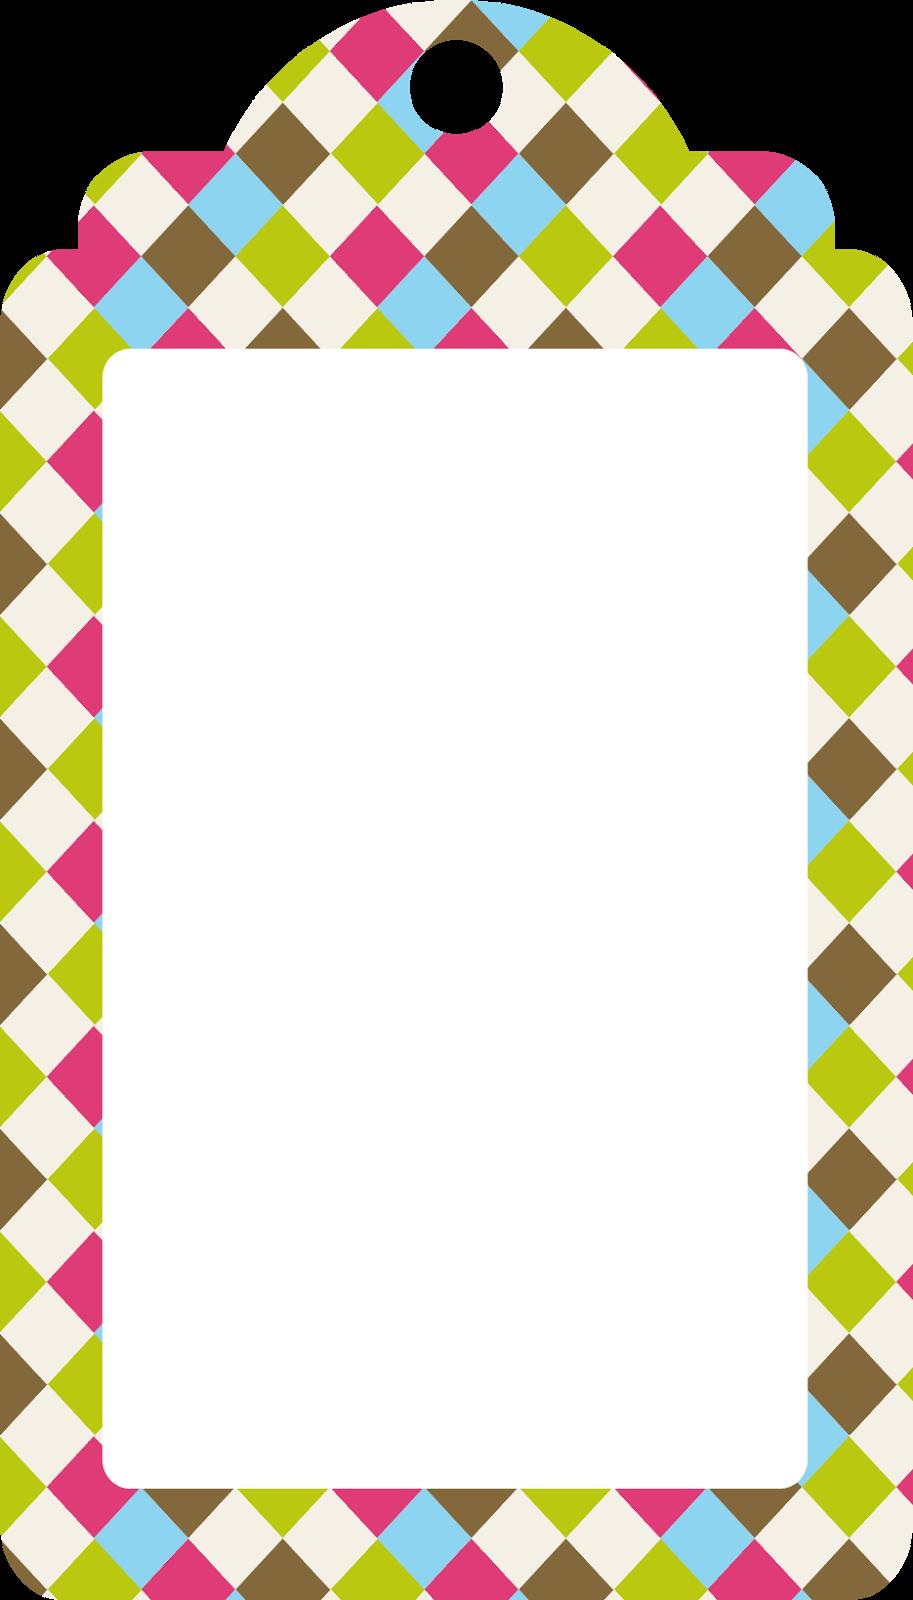 Tag/etiquetas grátis para imprimir | Pinterest | Etiquetas, Marcos y ...